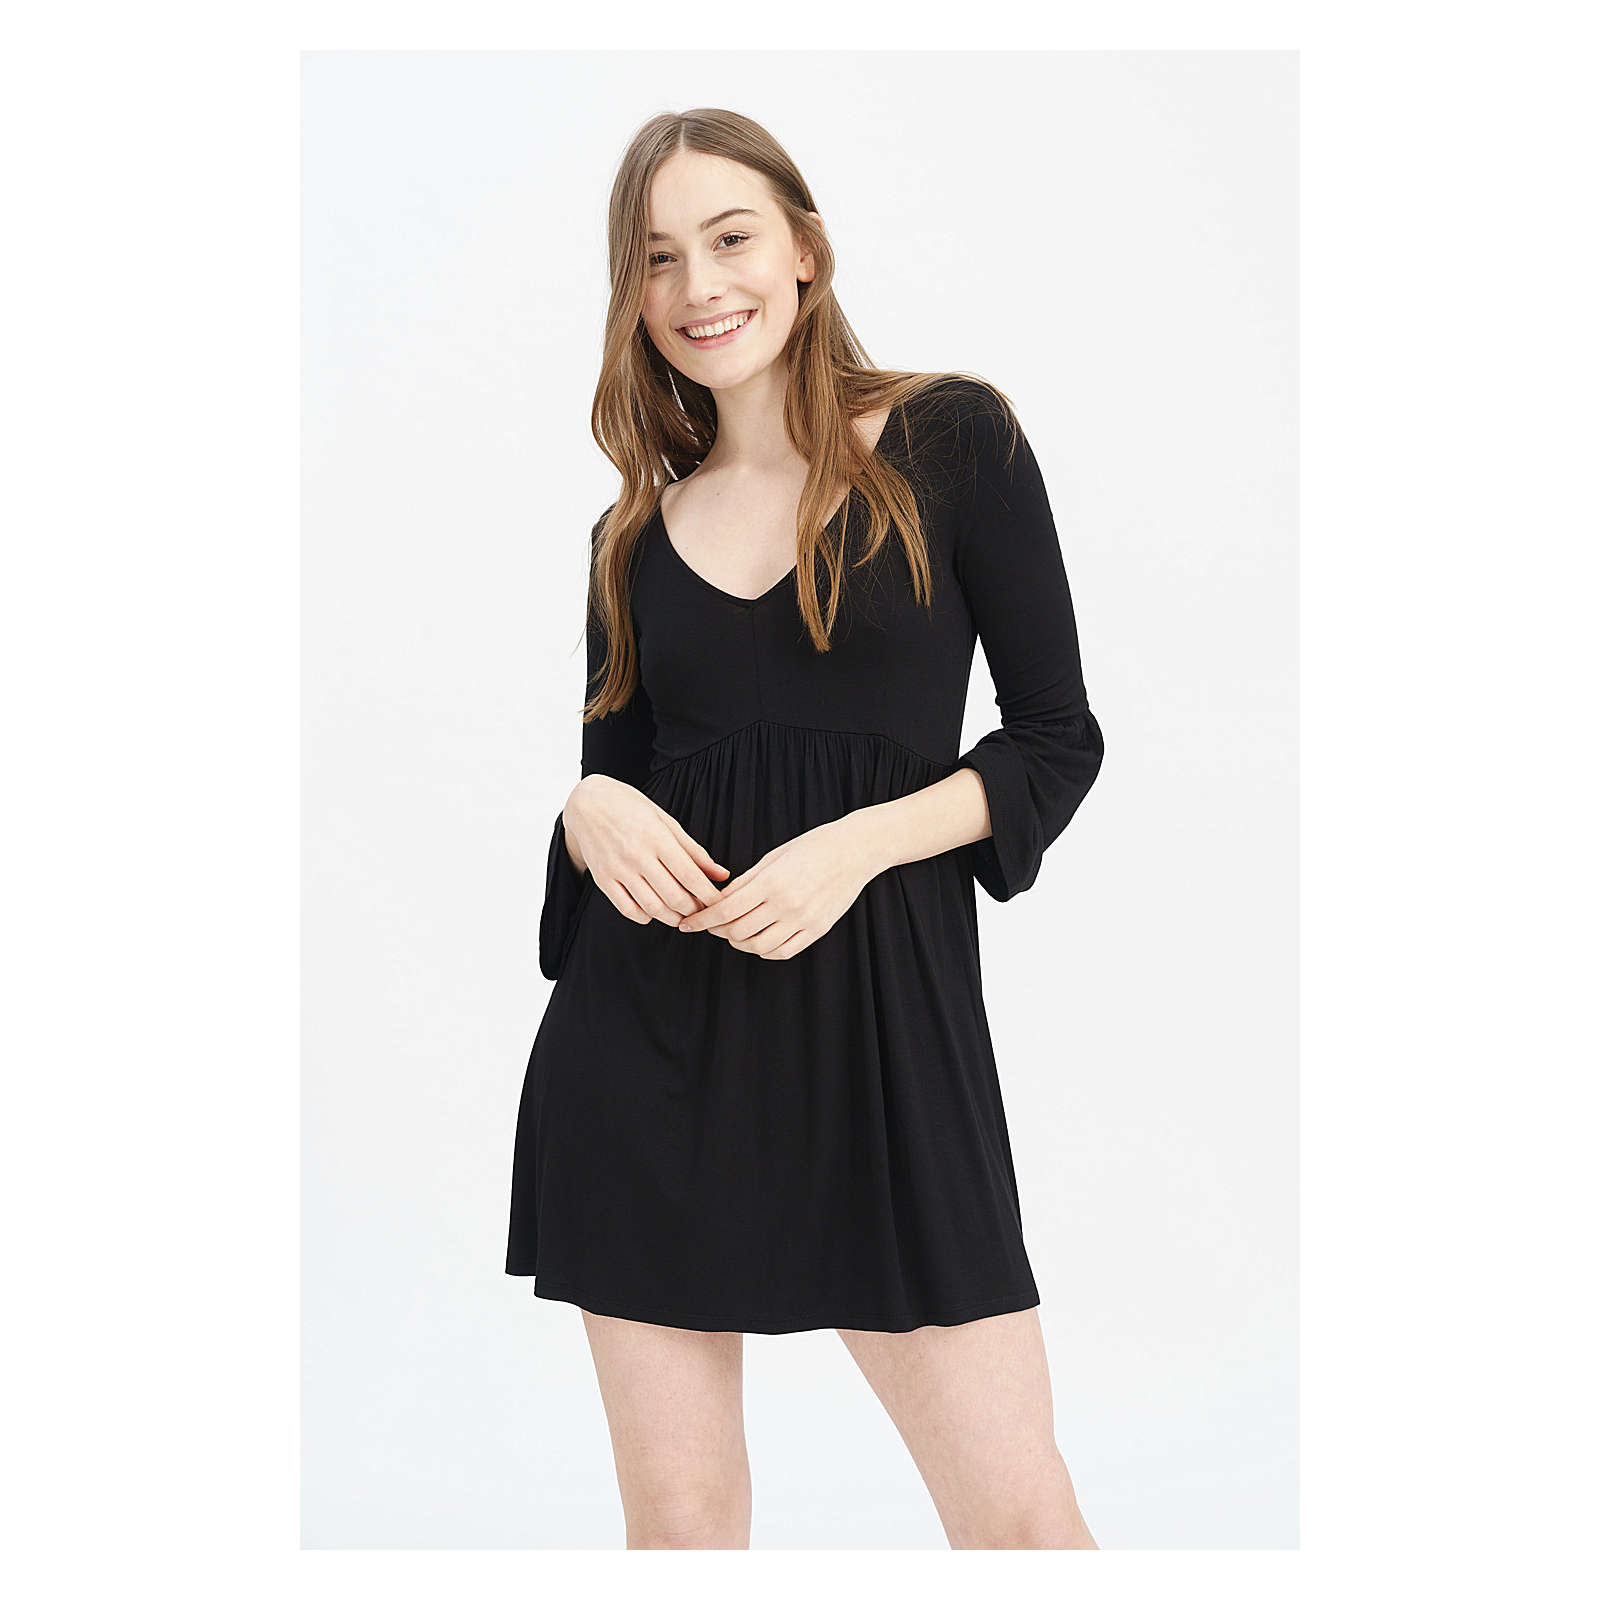 trueprodigy® trueprodigy Freizeitkleid Kleider schwarz Damen Gr. 42